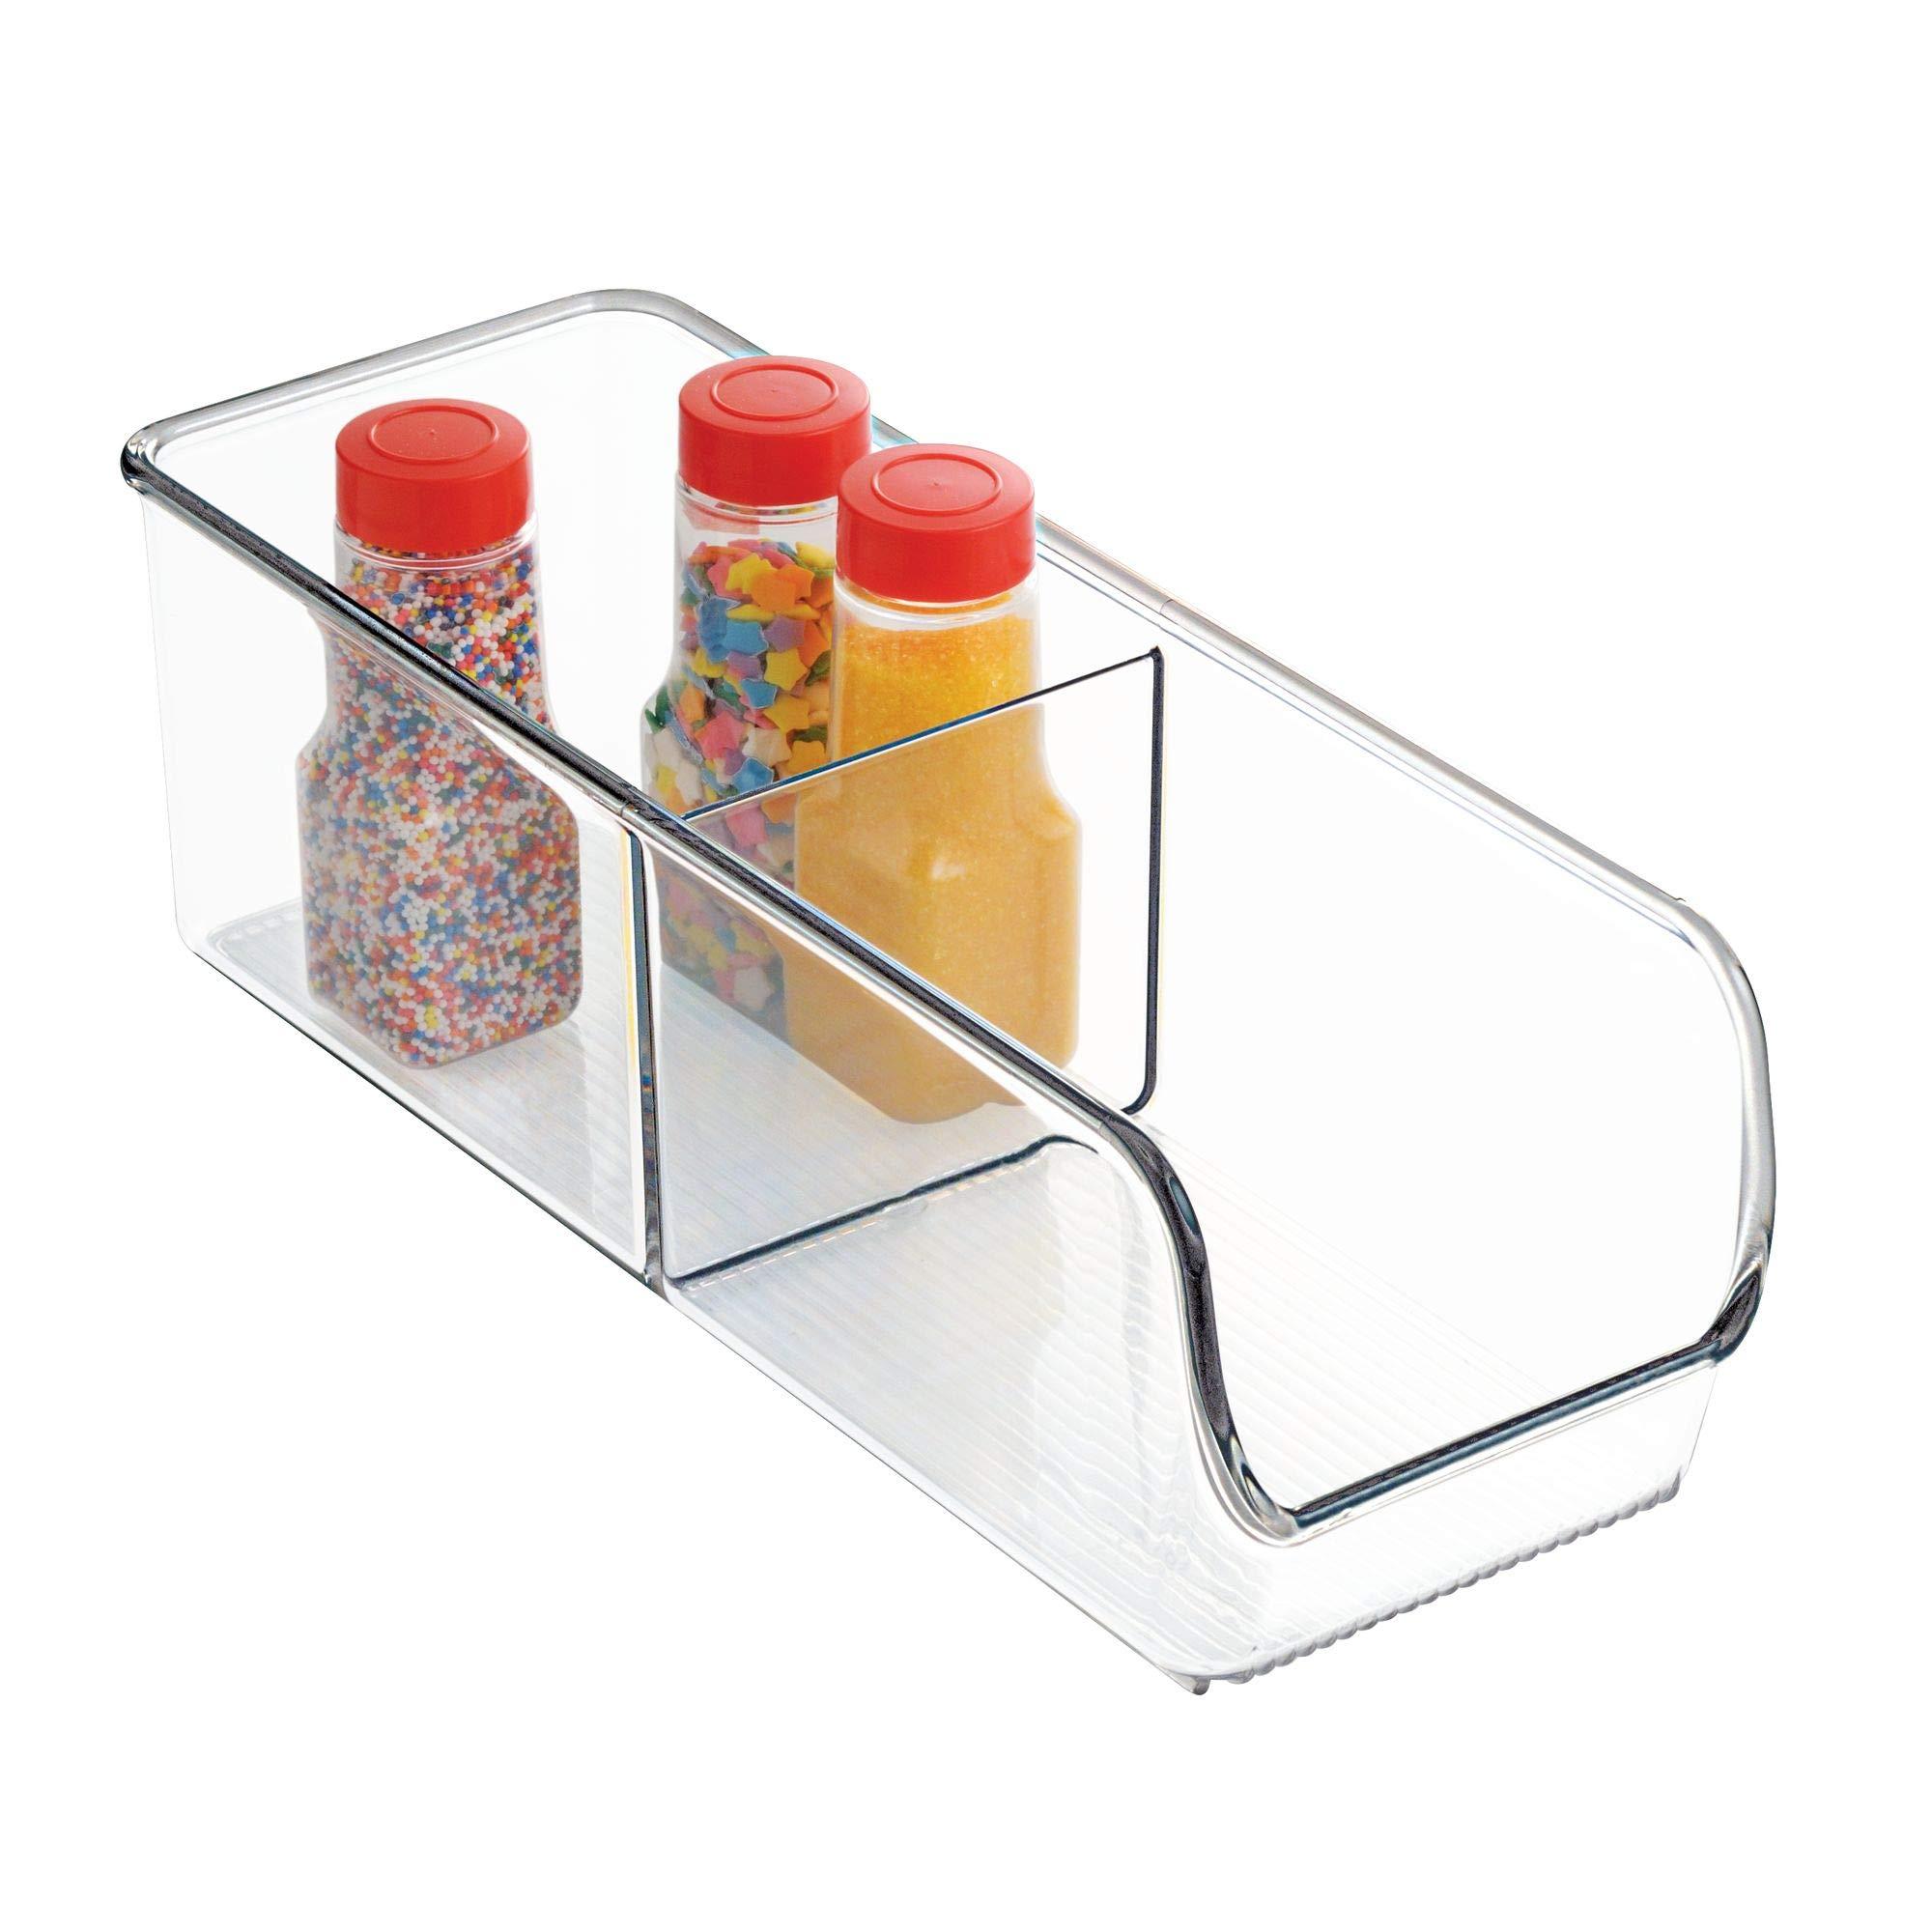 InterDesign Linus Organizador para la cocina, caja organizadora de plástico antirrotura de tamaño pequeño con